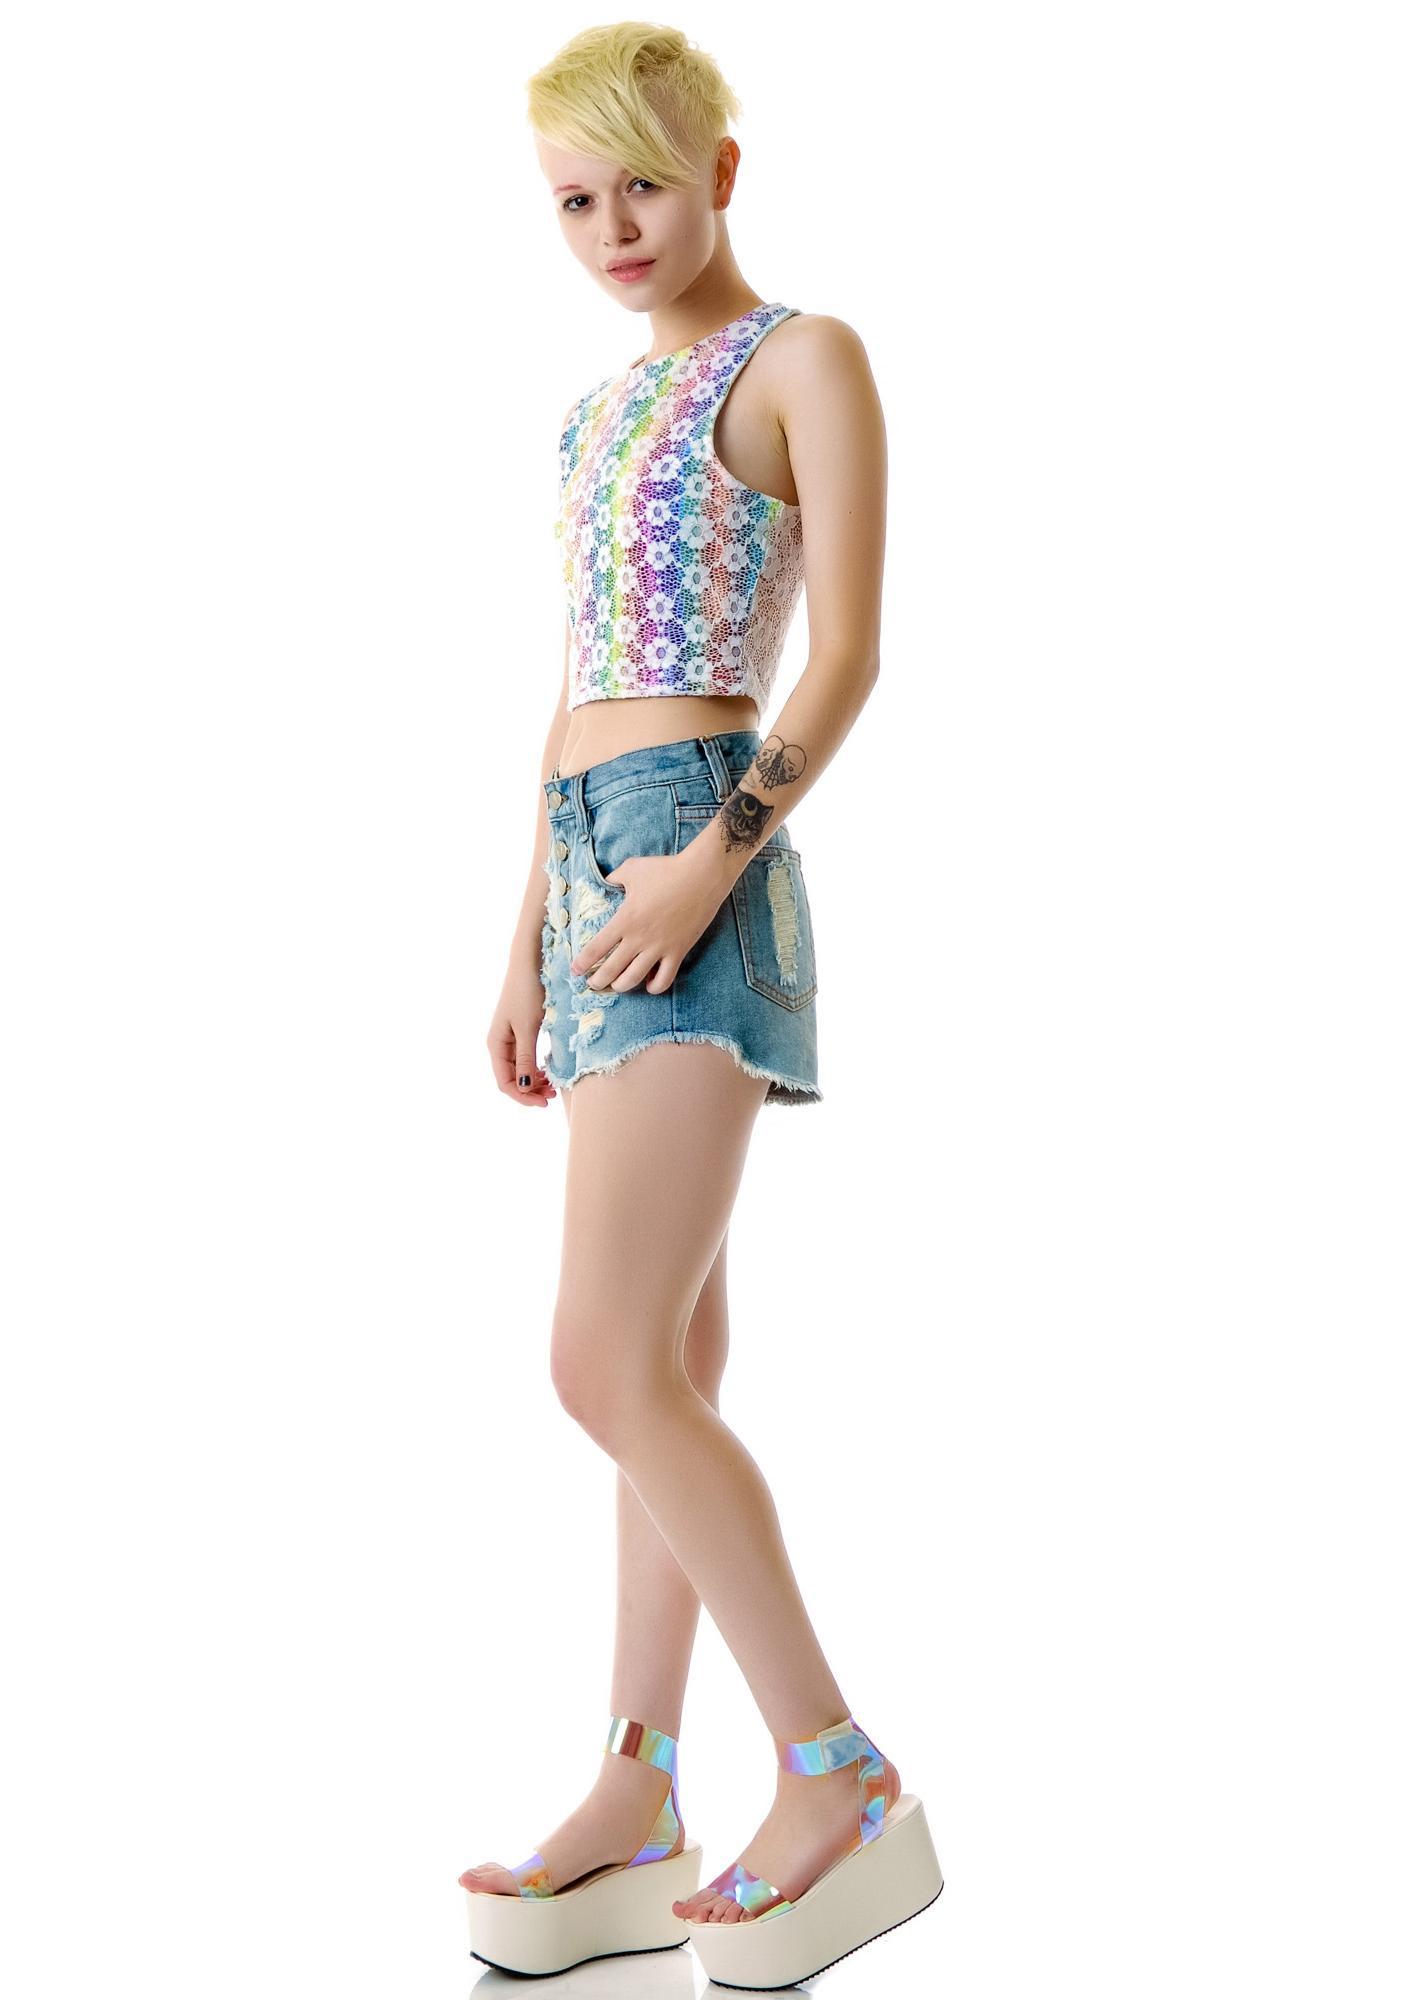 Mink Pink Exposed Slasher Flick Denim Shorts